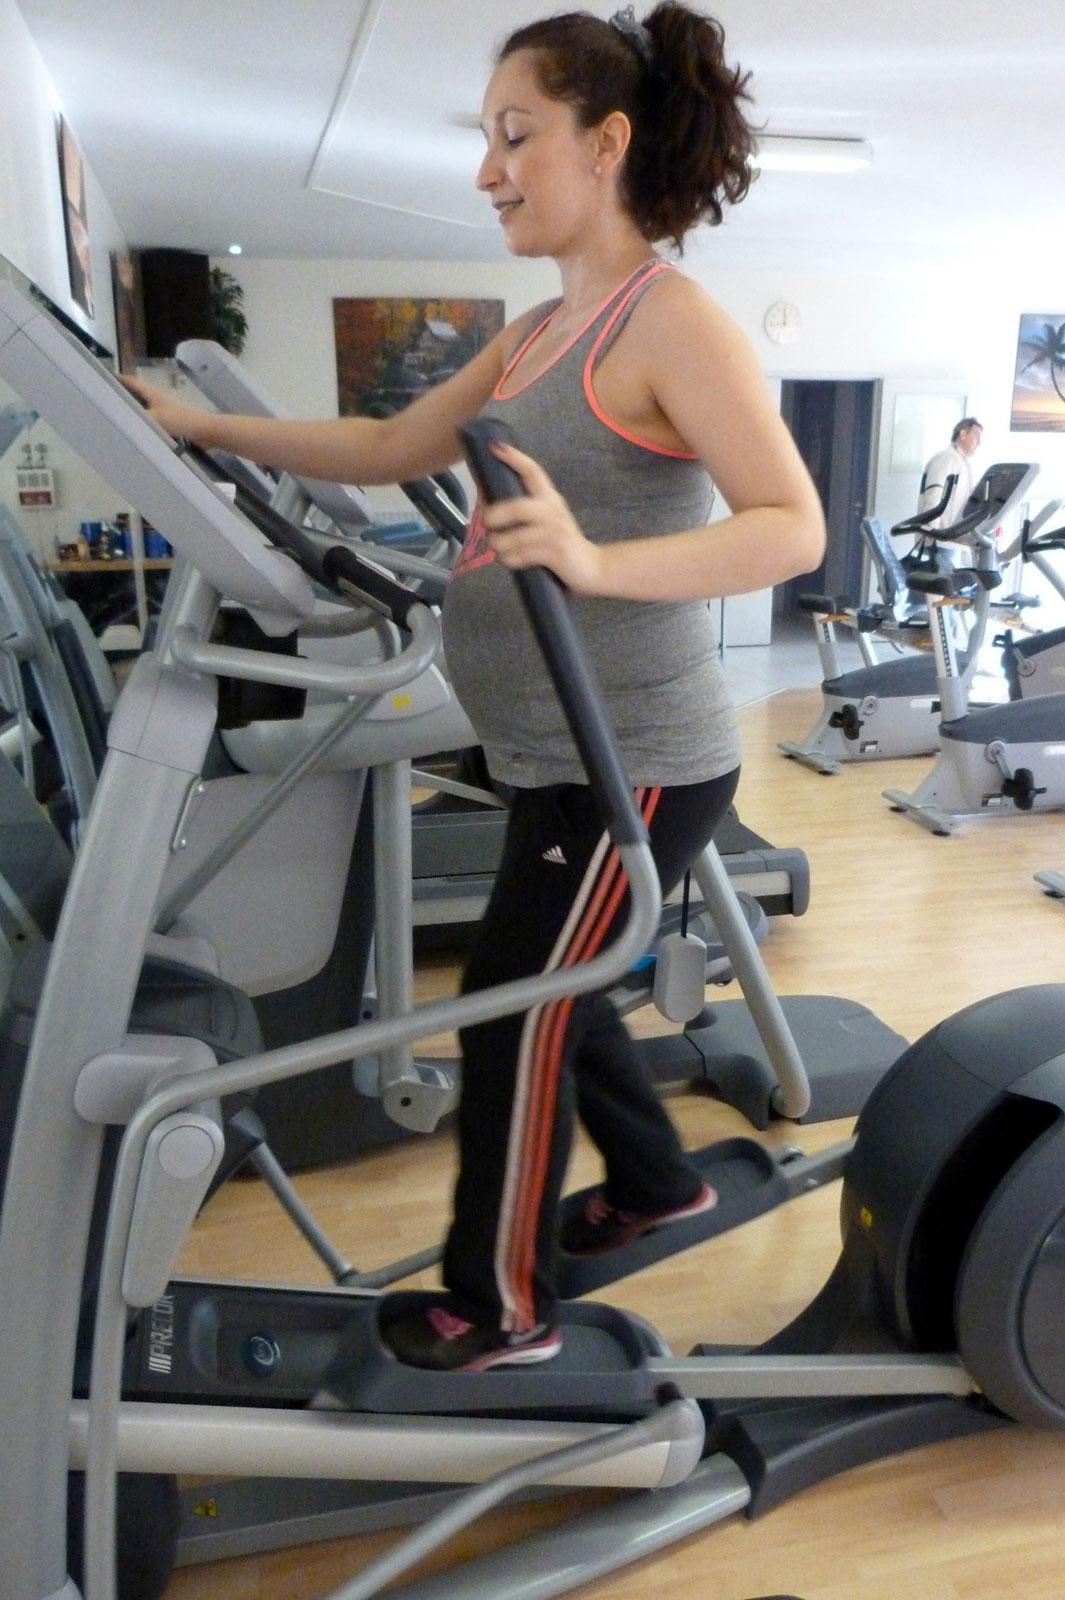 salle de sport bergerac Elliptique Fitness Crosstrainer EFX 835 CroosRamp Precor 2